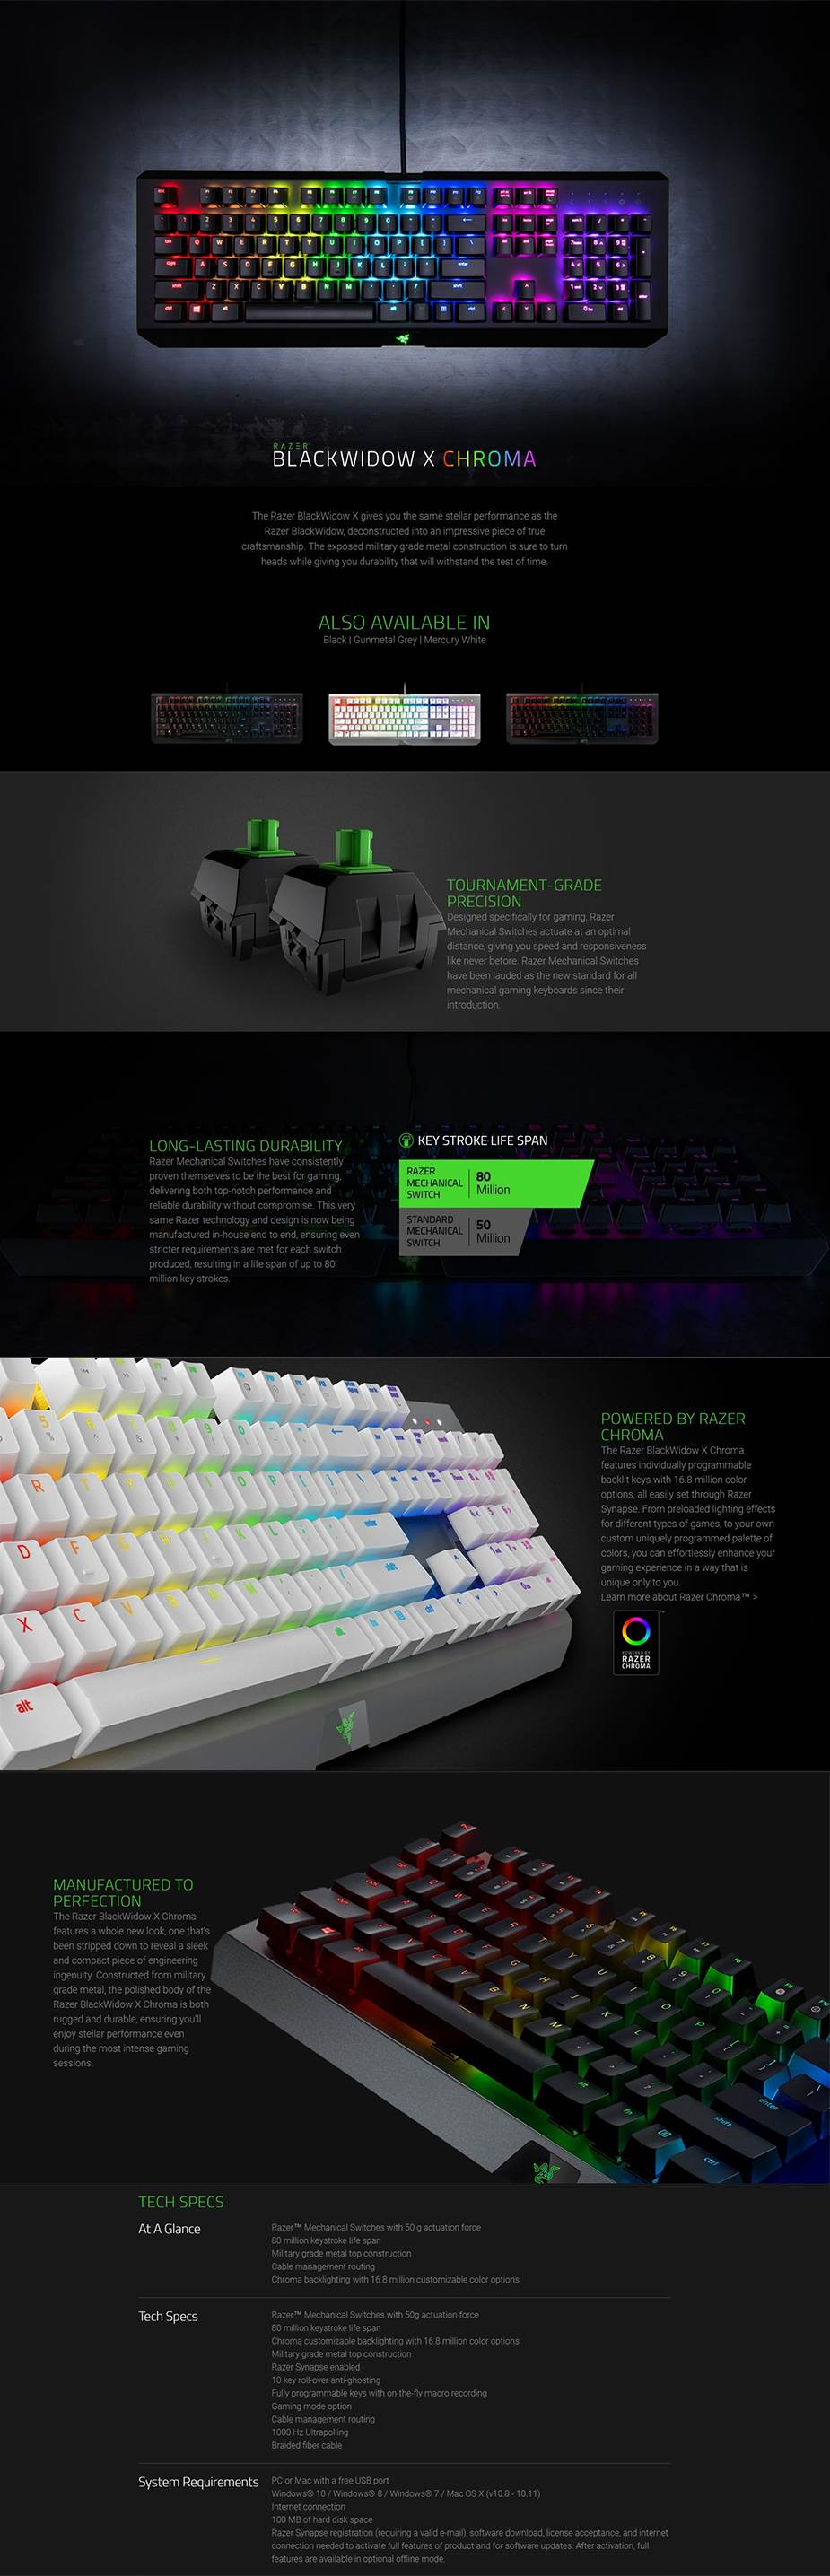 Razer Blackwidow X Chroma Mechanical Gaming Keyboard - Gunmetal Edition